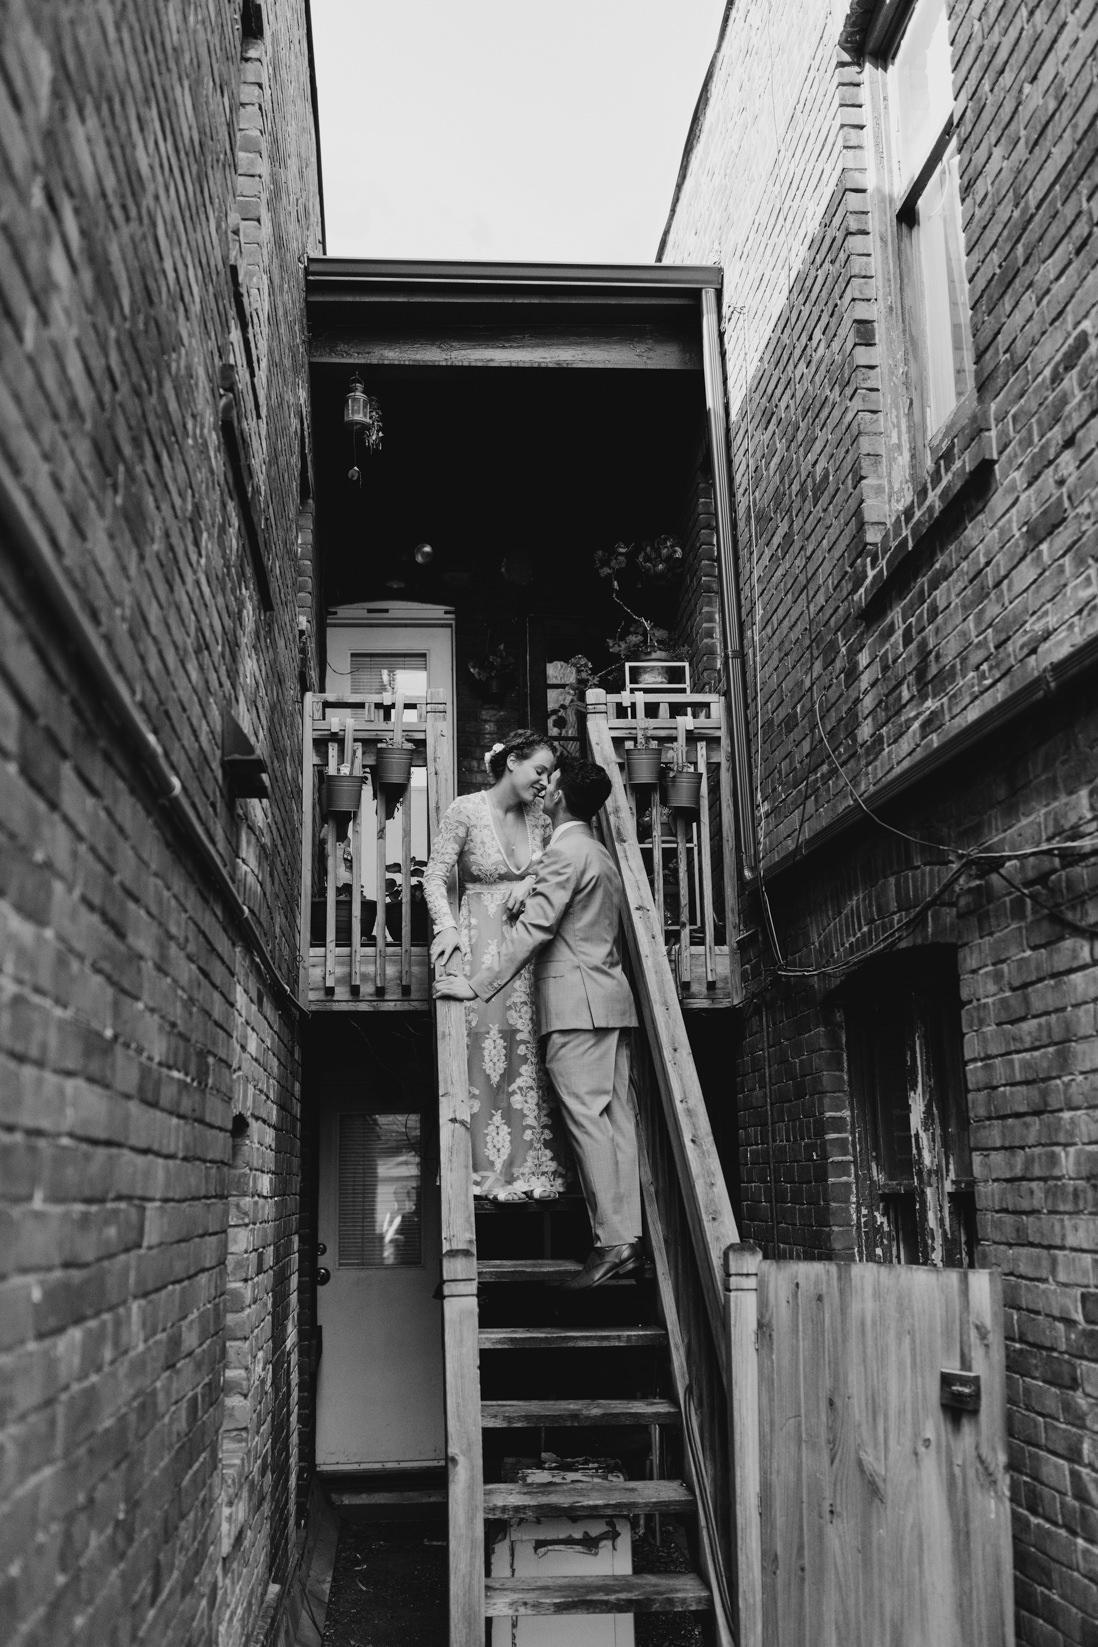 urban city wedding portraits fire escape stairway Toronto_EightyFifth Street Photography